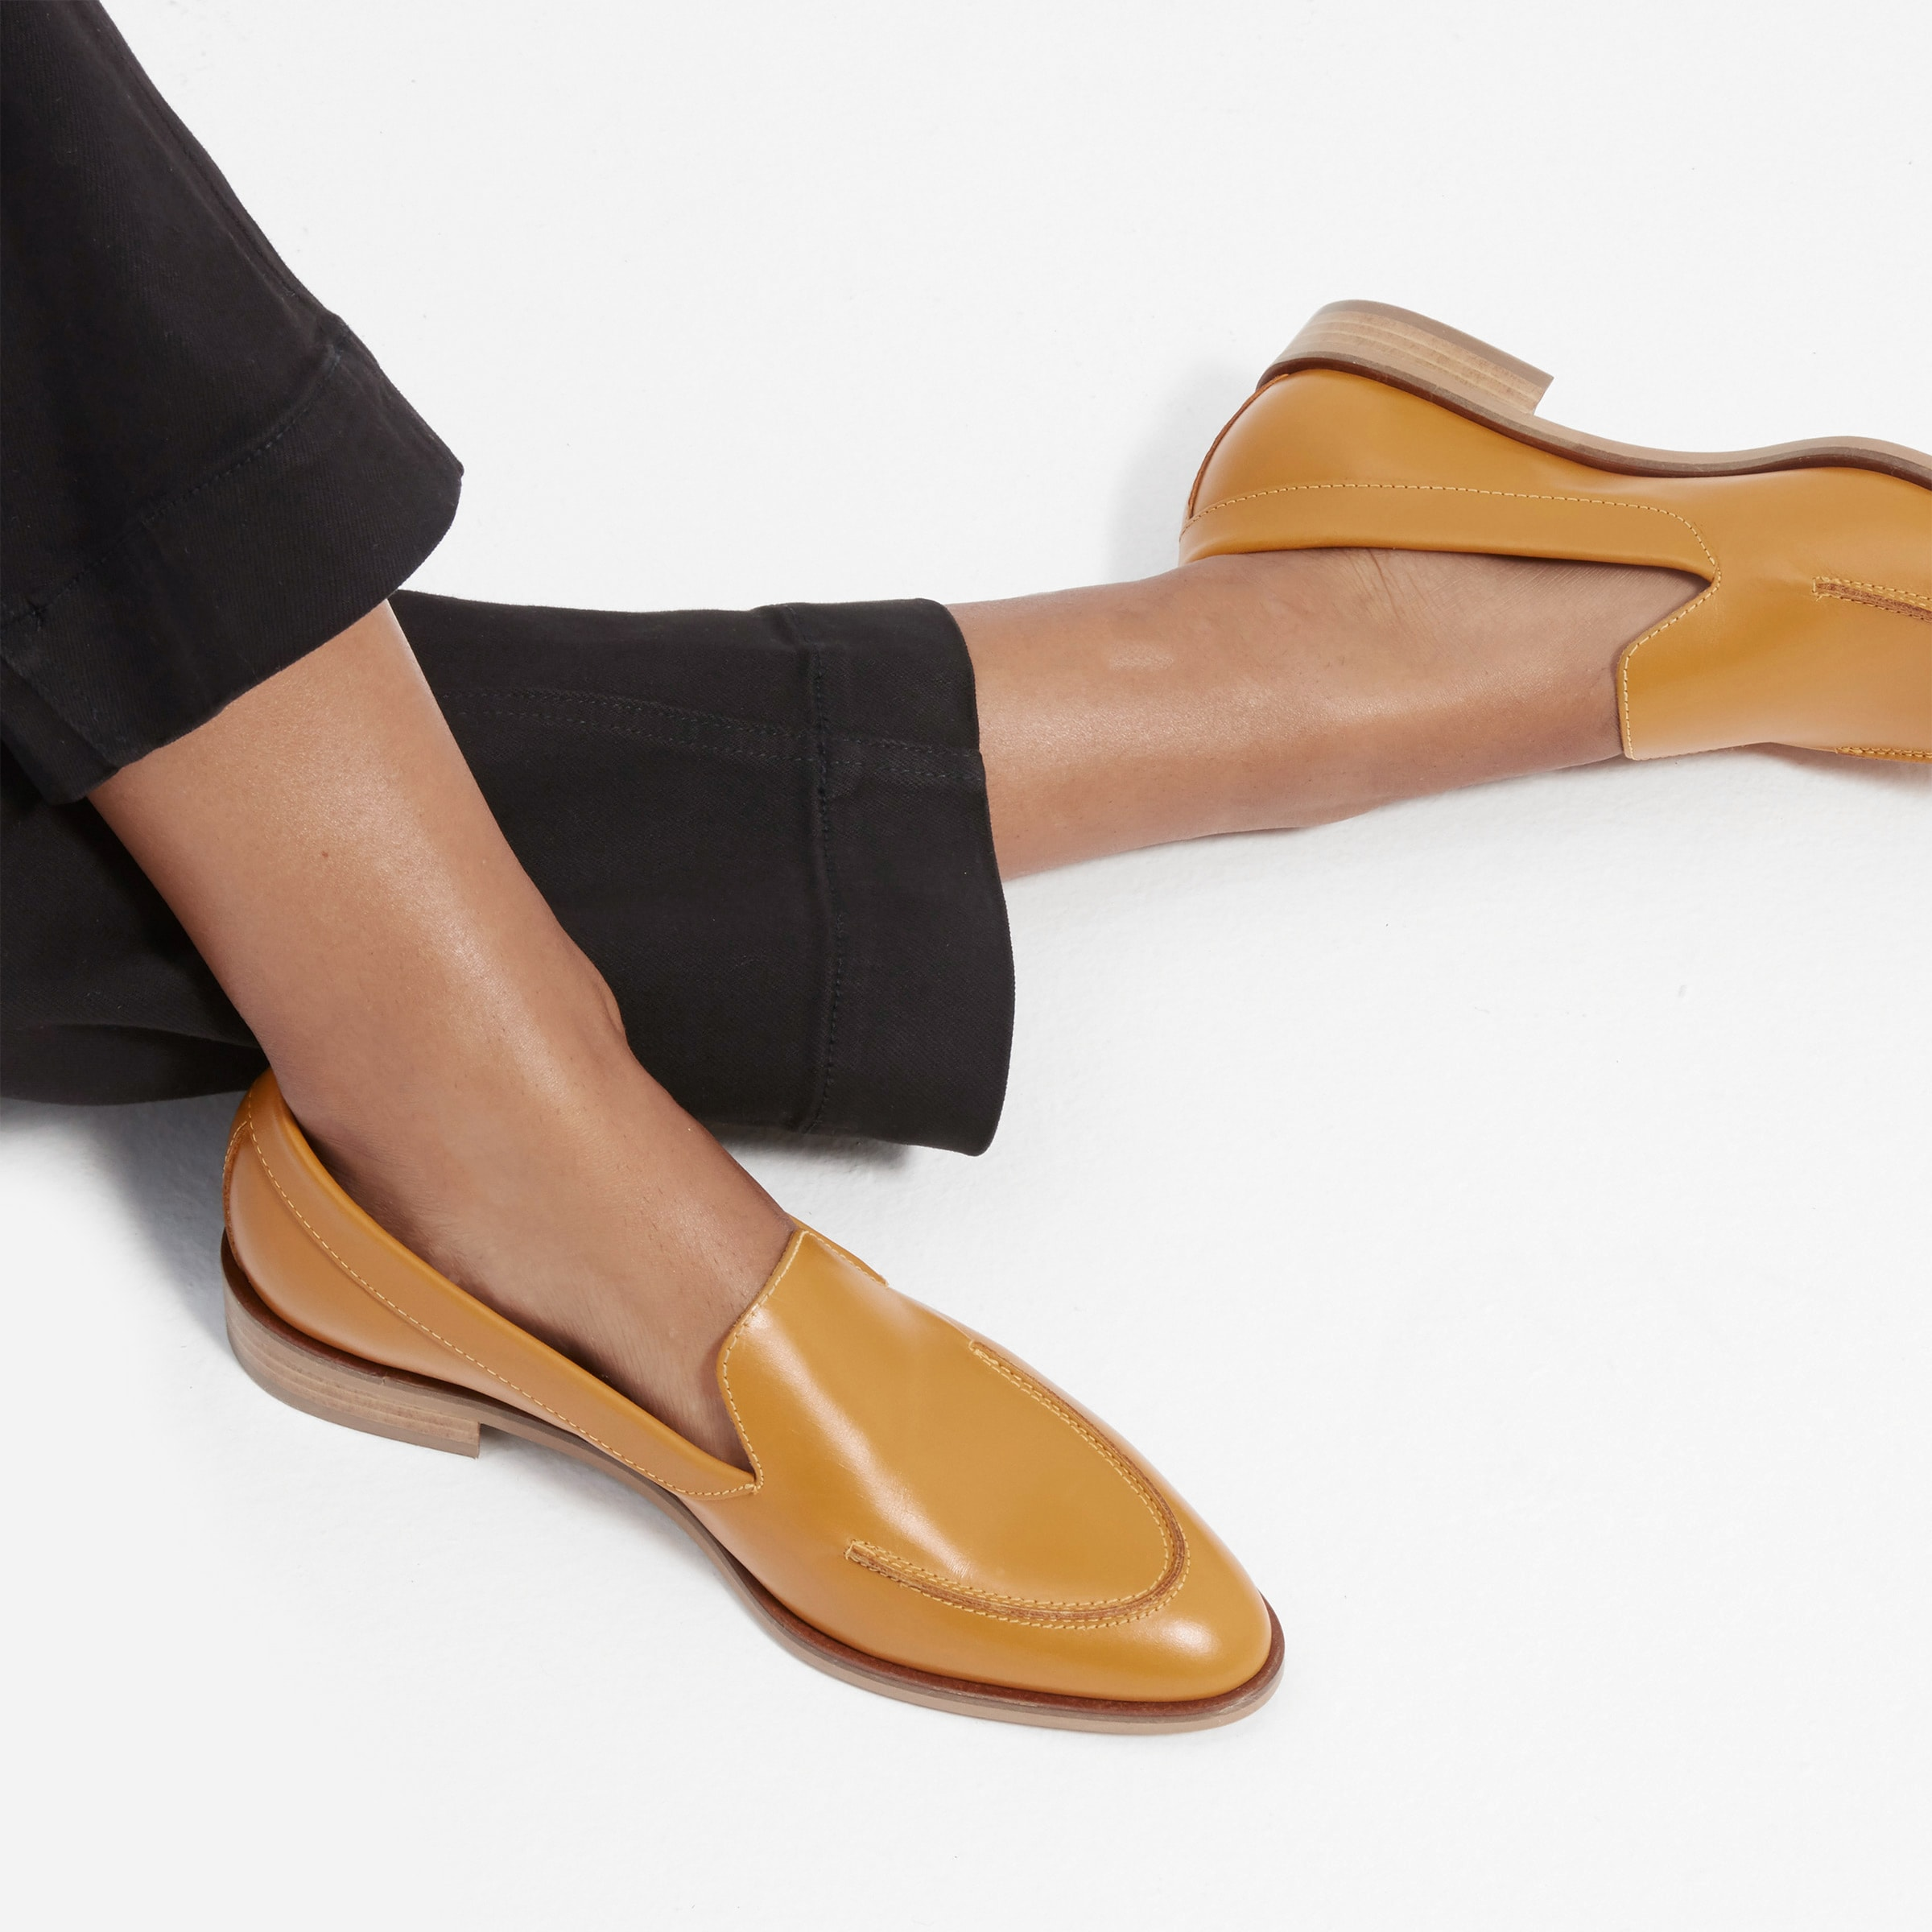 The Modern Loafer – Everlane